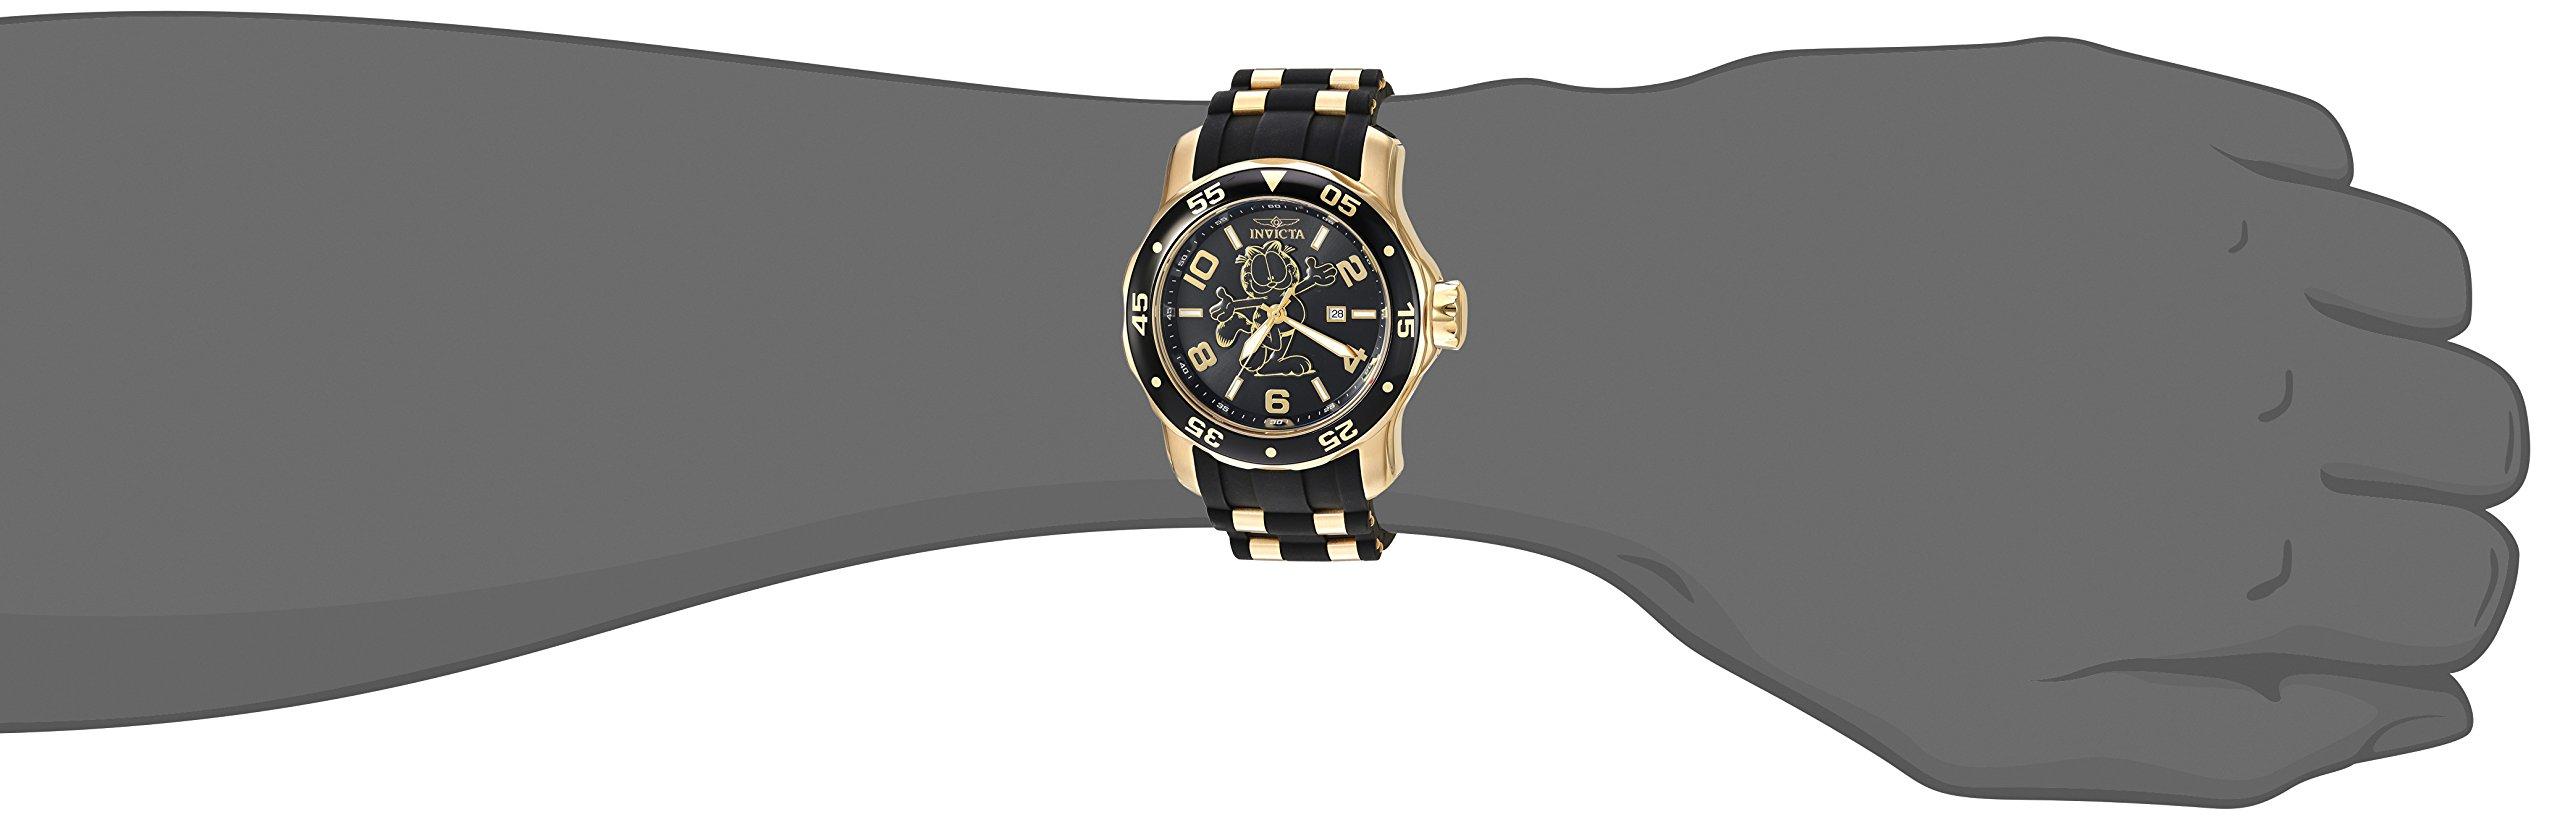 Invicta-Armbanduhr-25157